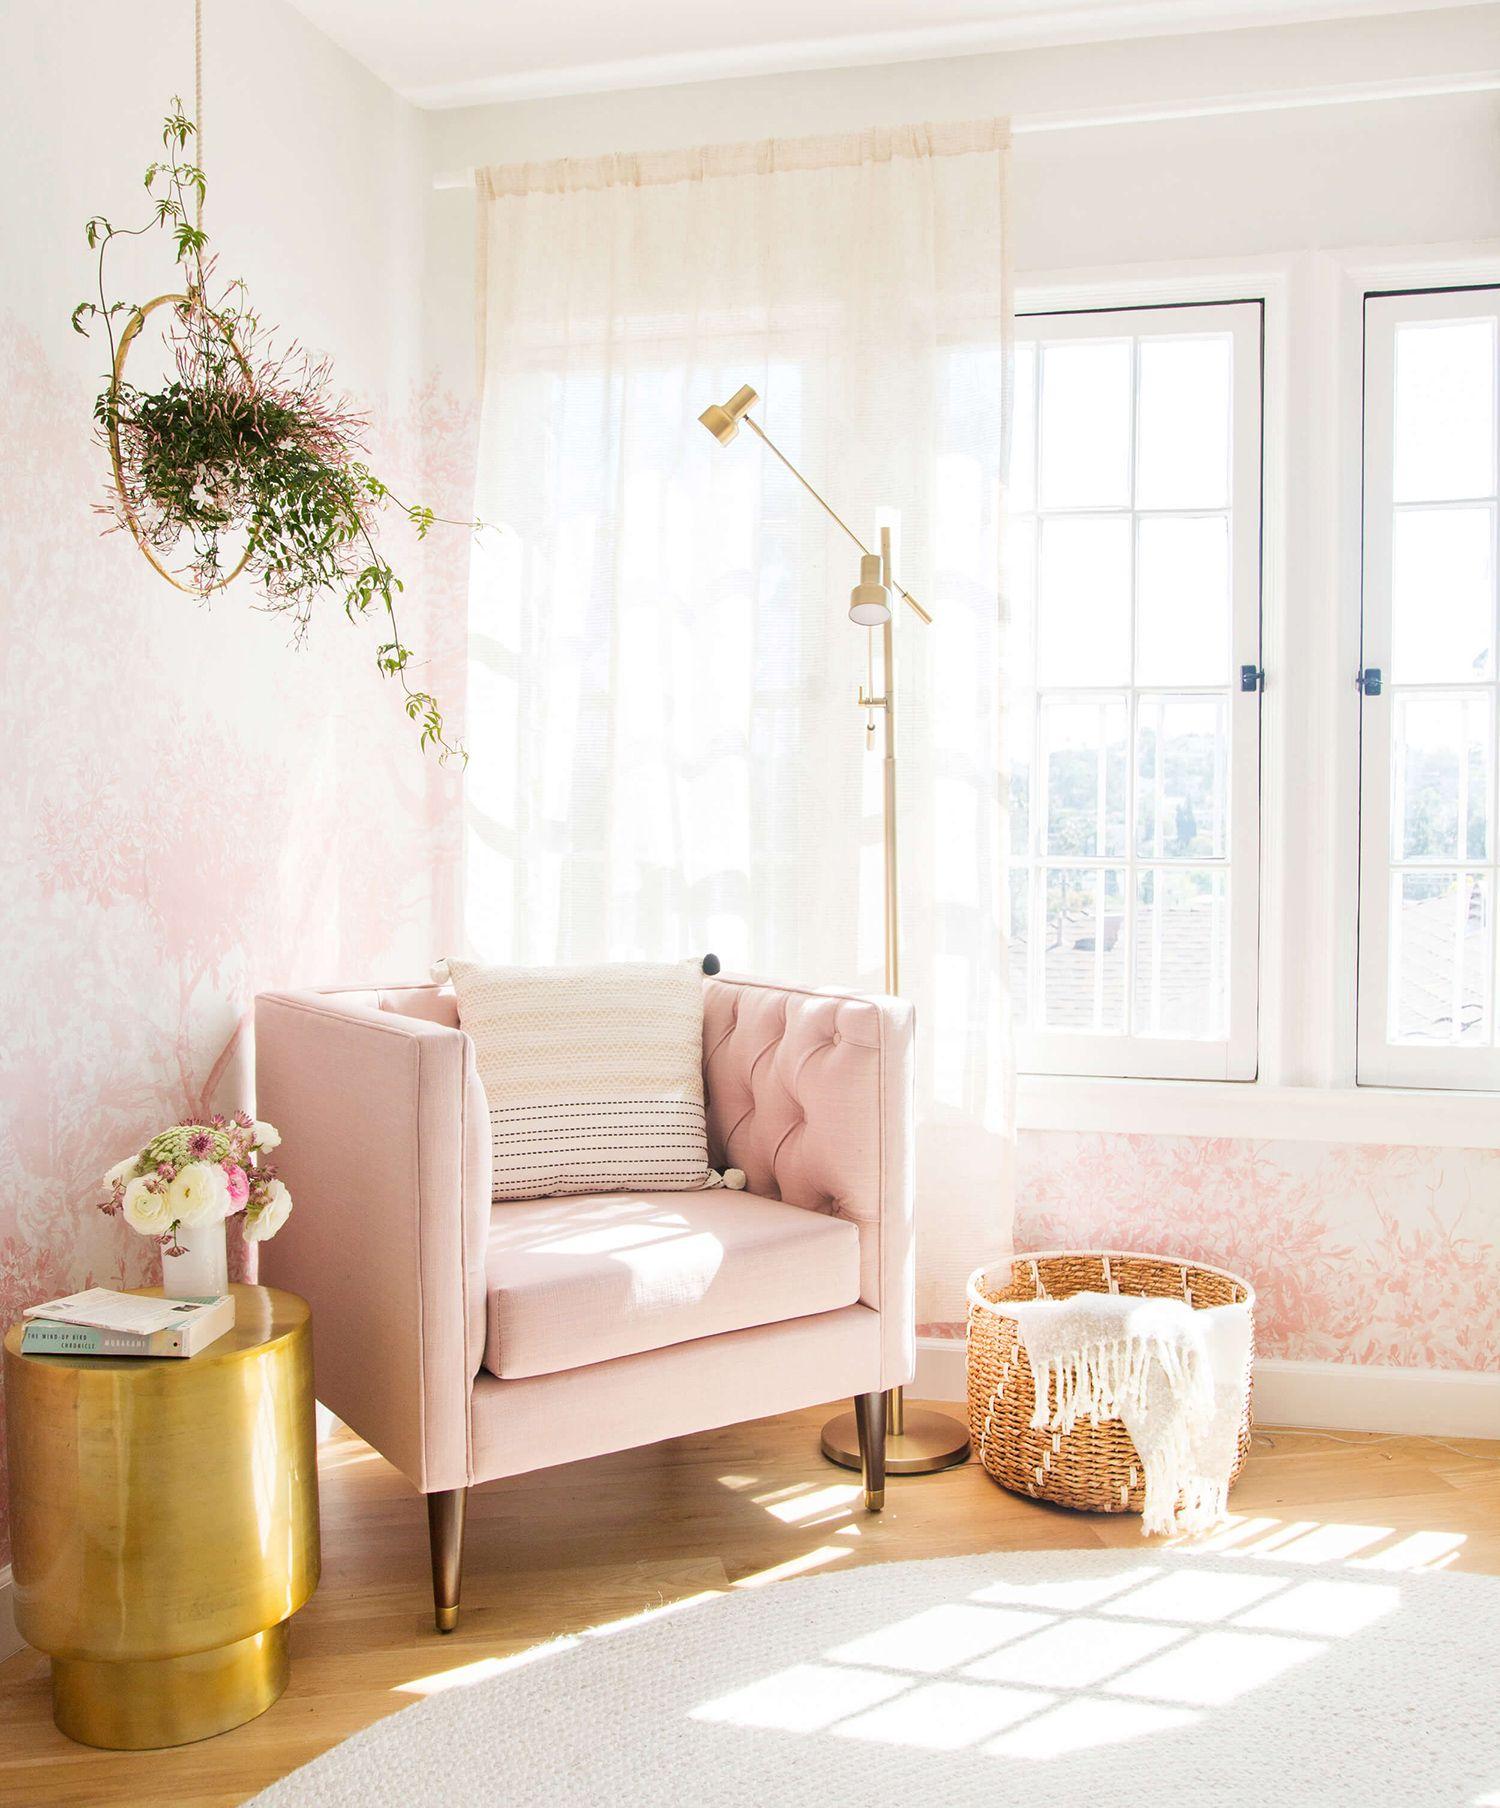 Labor Day Furniture & Home Decor Sales | Pinterest | Labour, House ...